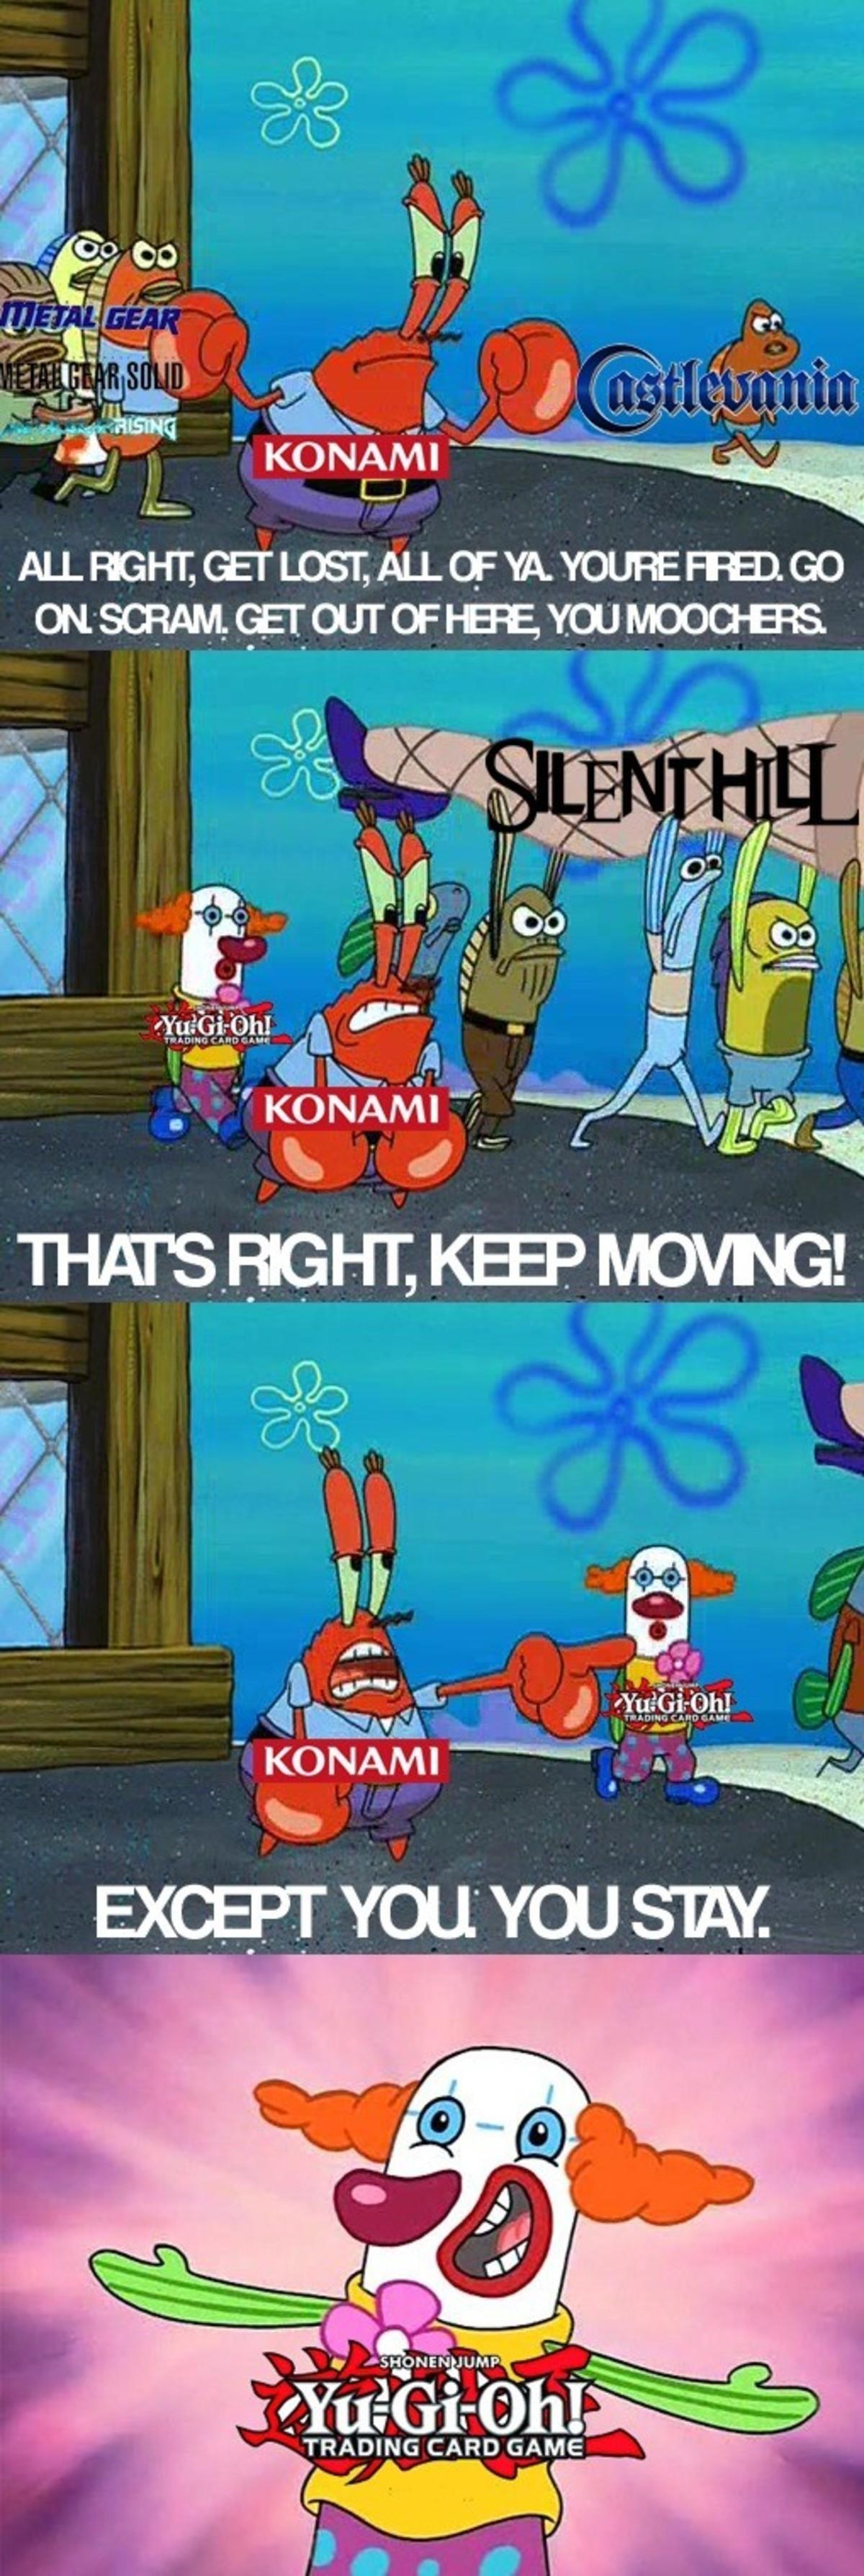 KOMANMO. .. Apparently Konami still looks at Contra's corpse